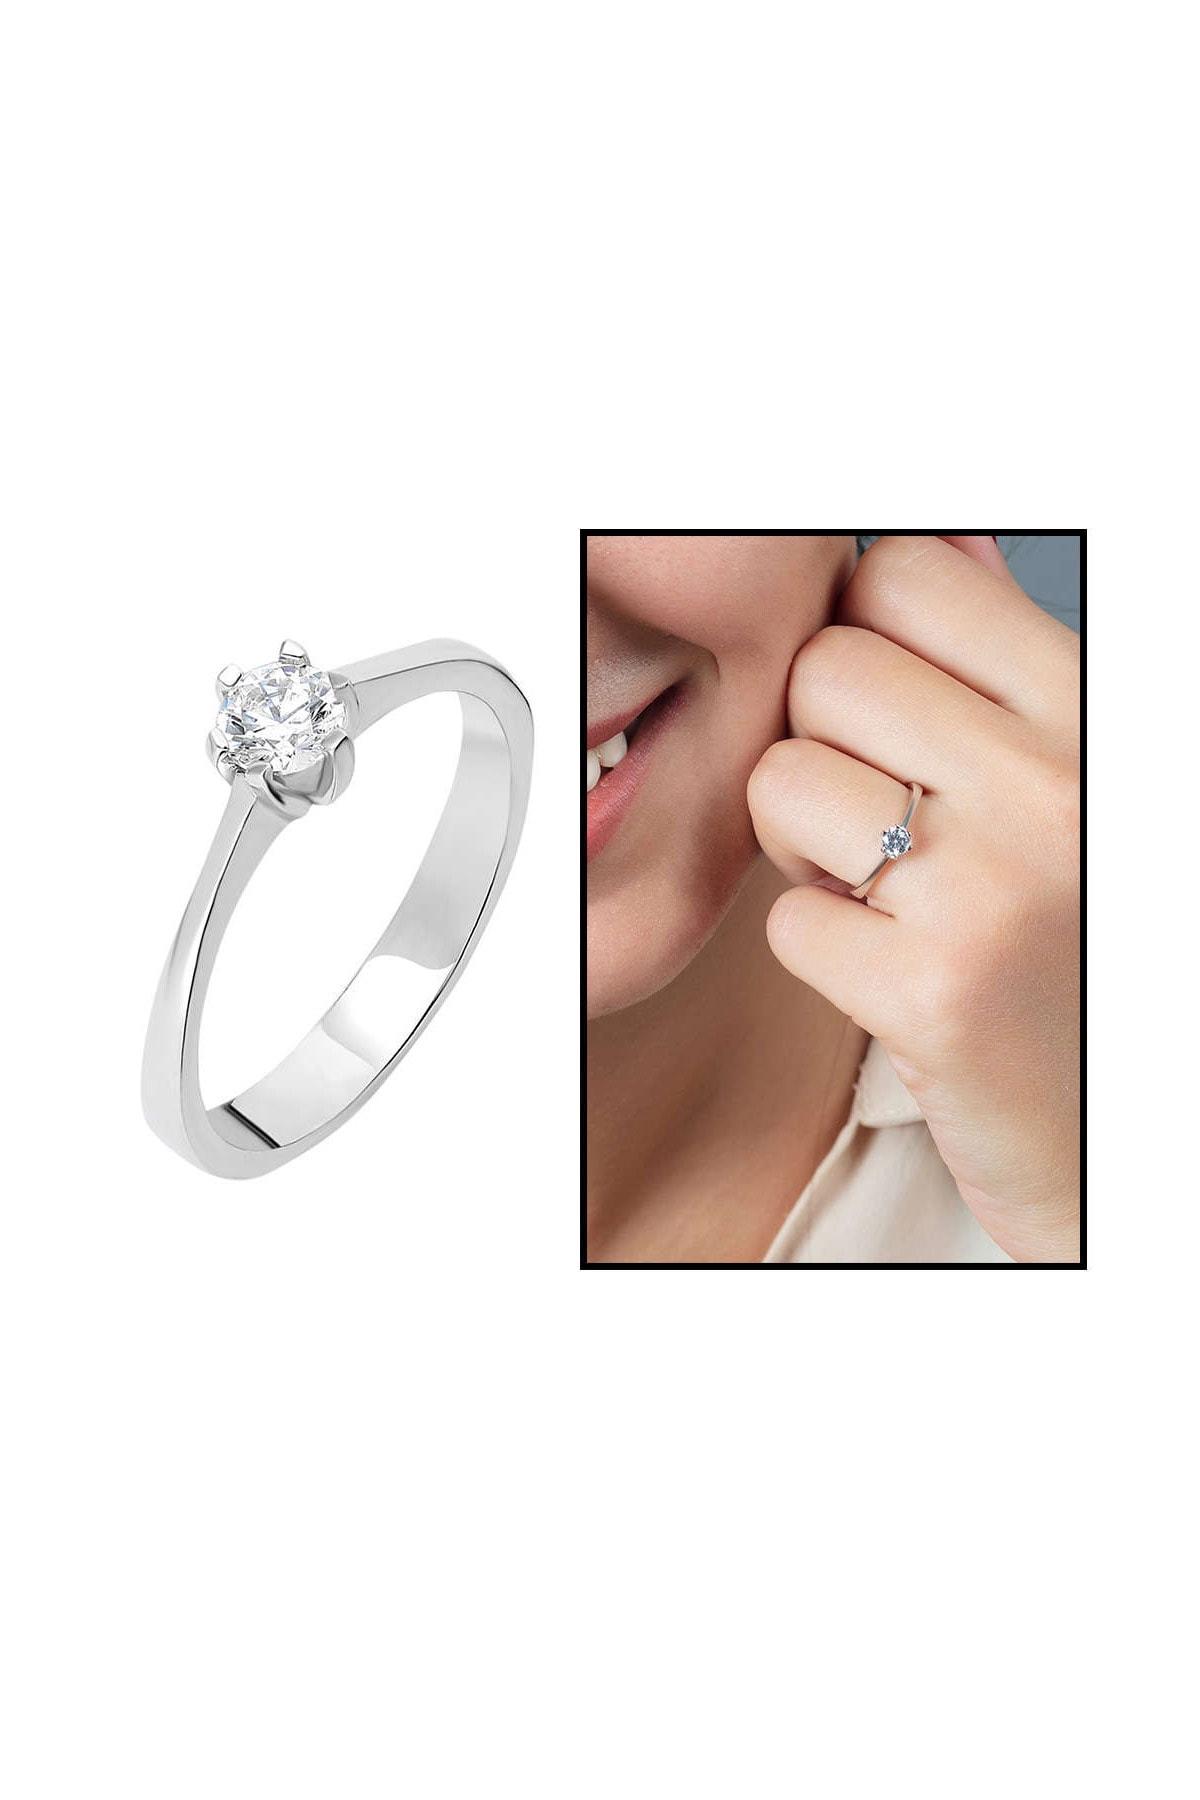 Tesbihane Starlight Diamond Pırlanta Montür Oval Tasarım 925 Ayar Gümüş Bayan Tektaş Yüzük 102001791 1